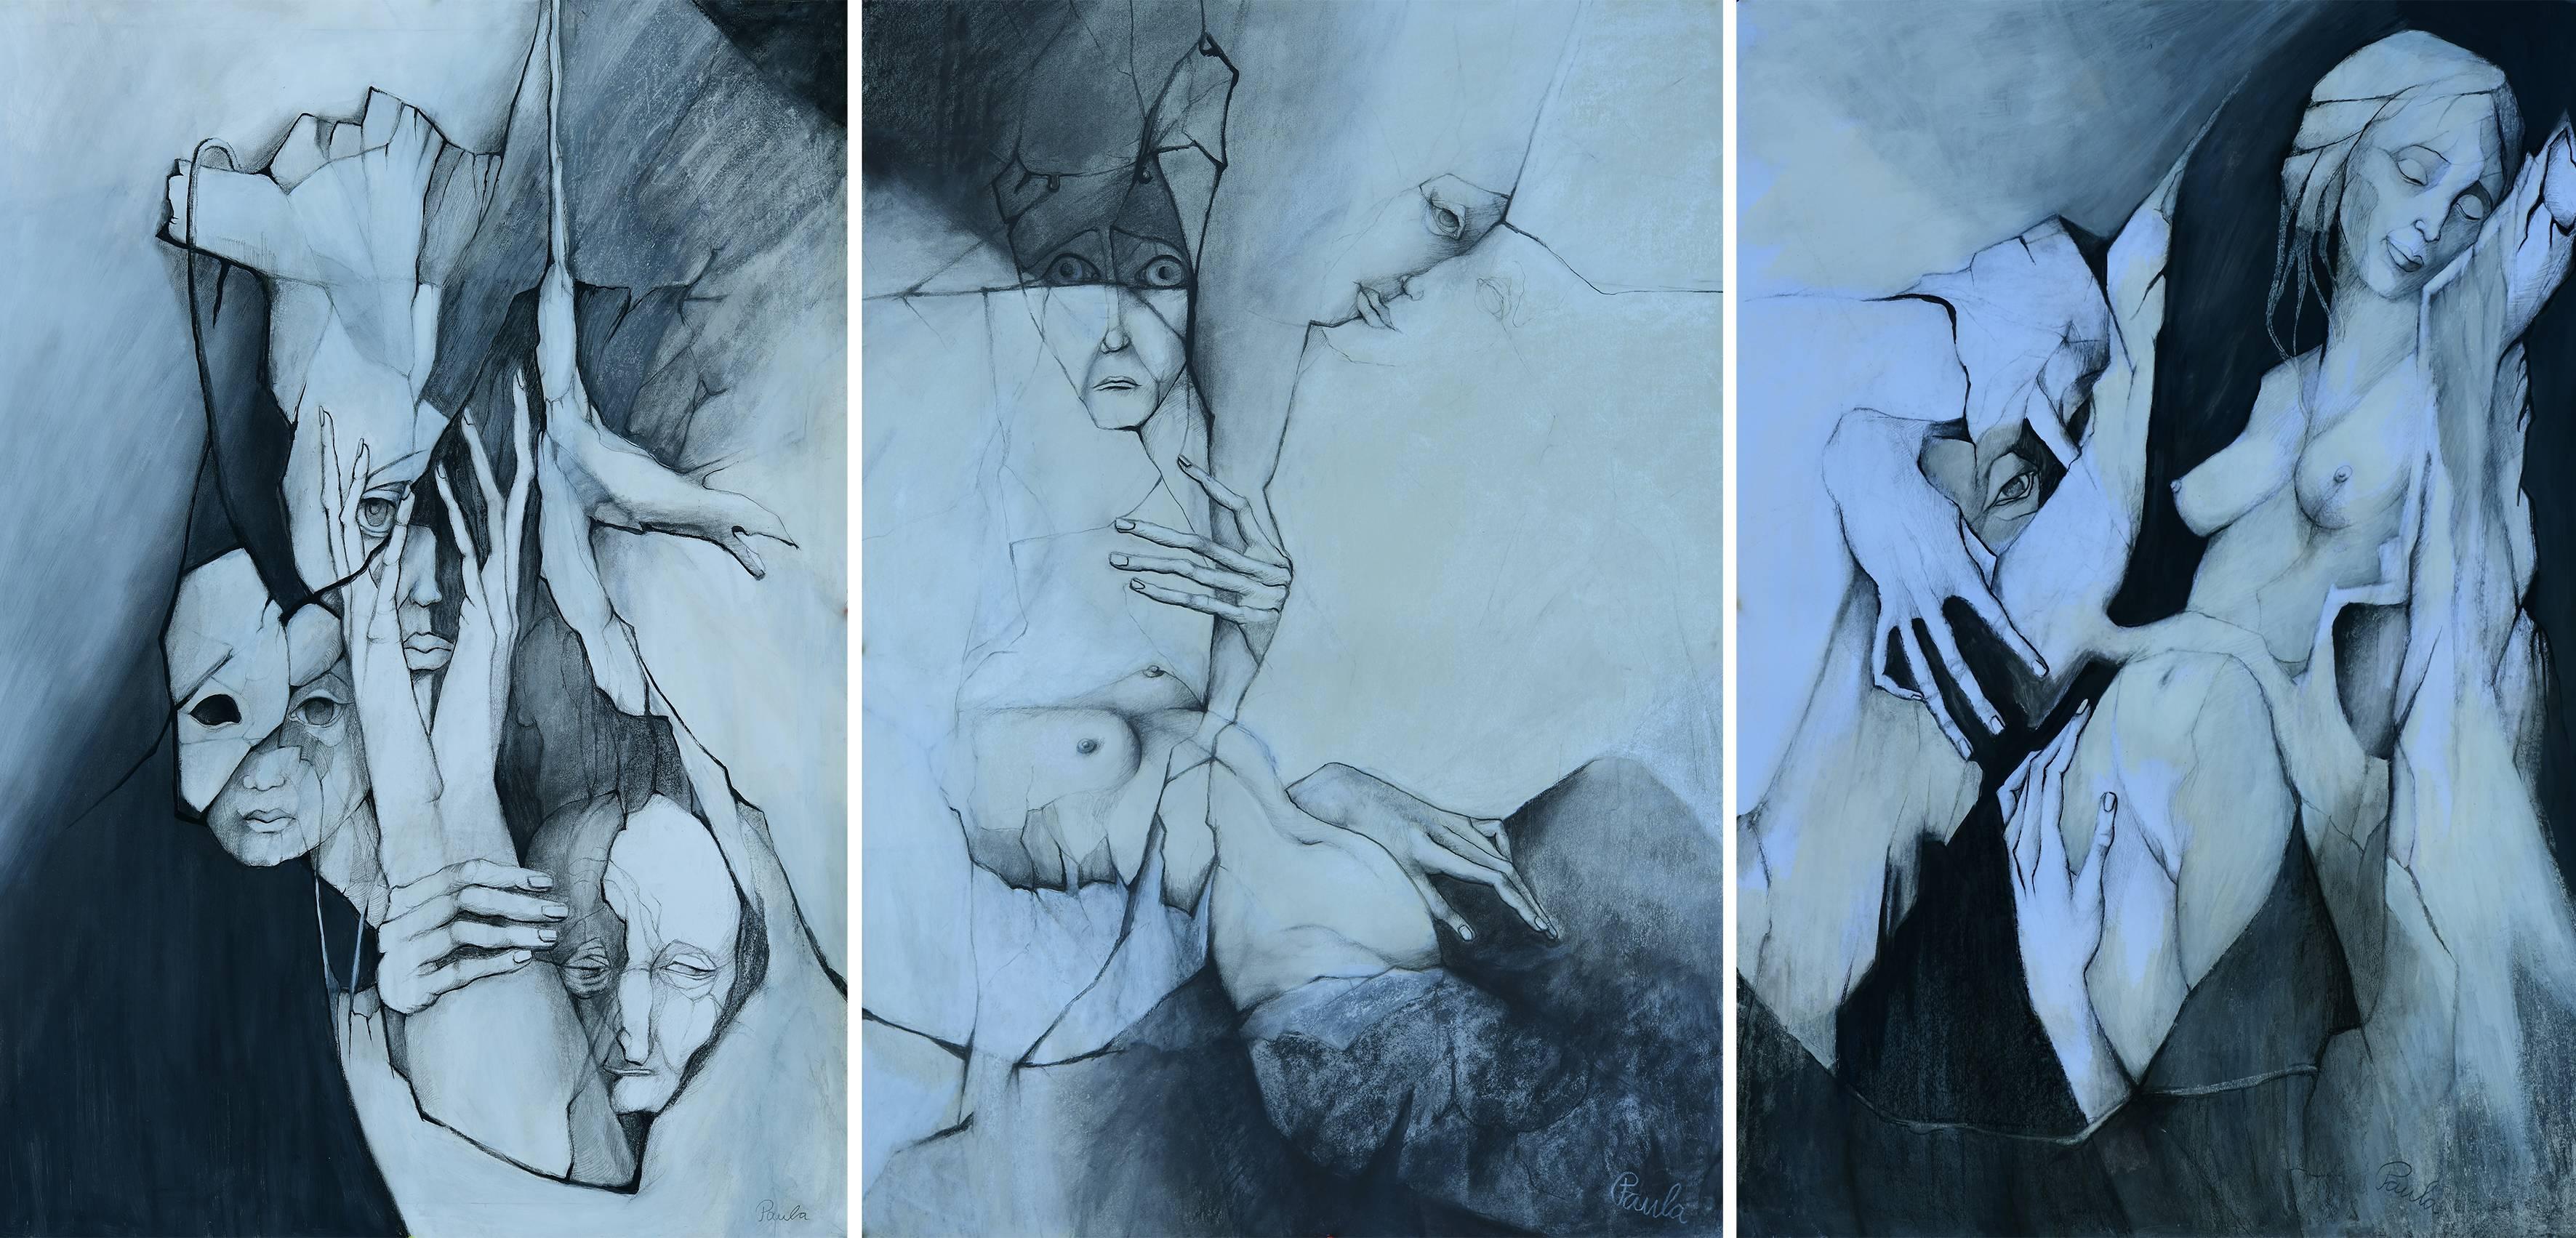 BRIGITTE GERLACH (Paula): Lebenszyklus, Triptychon